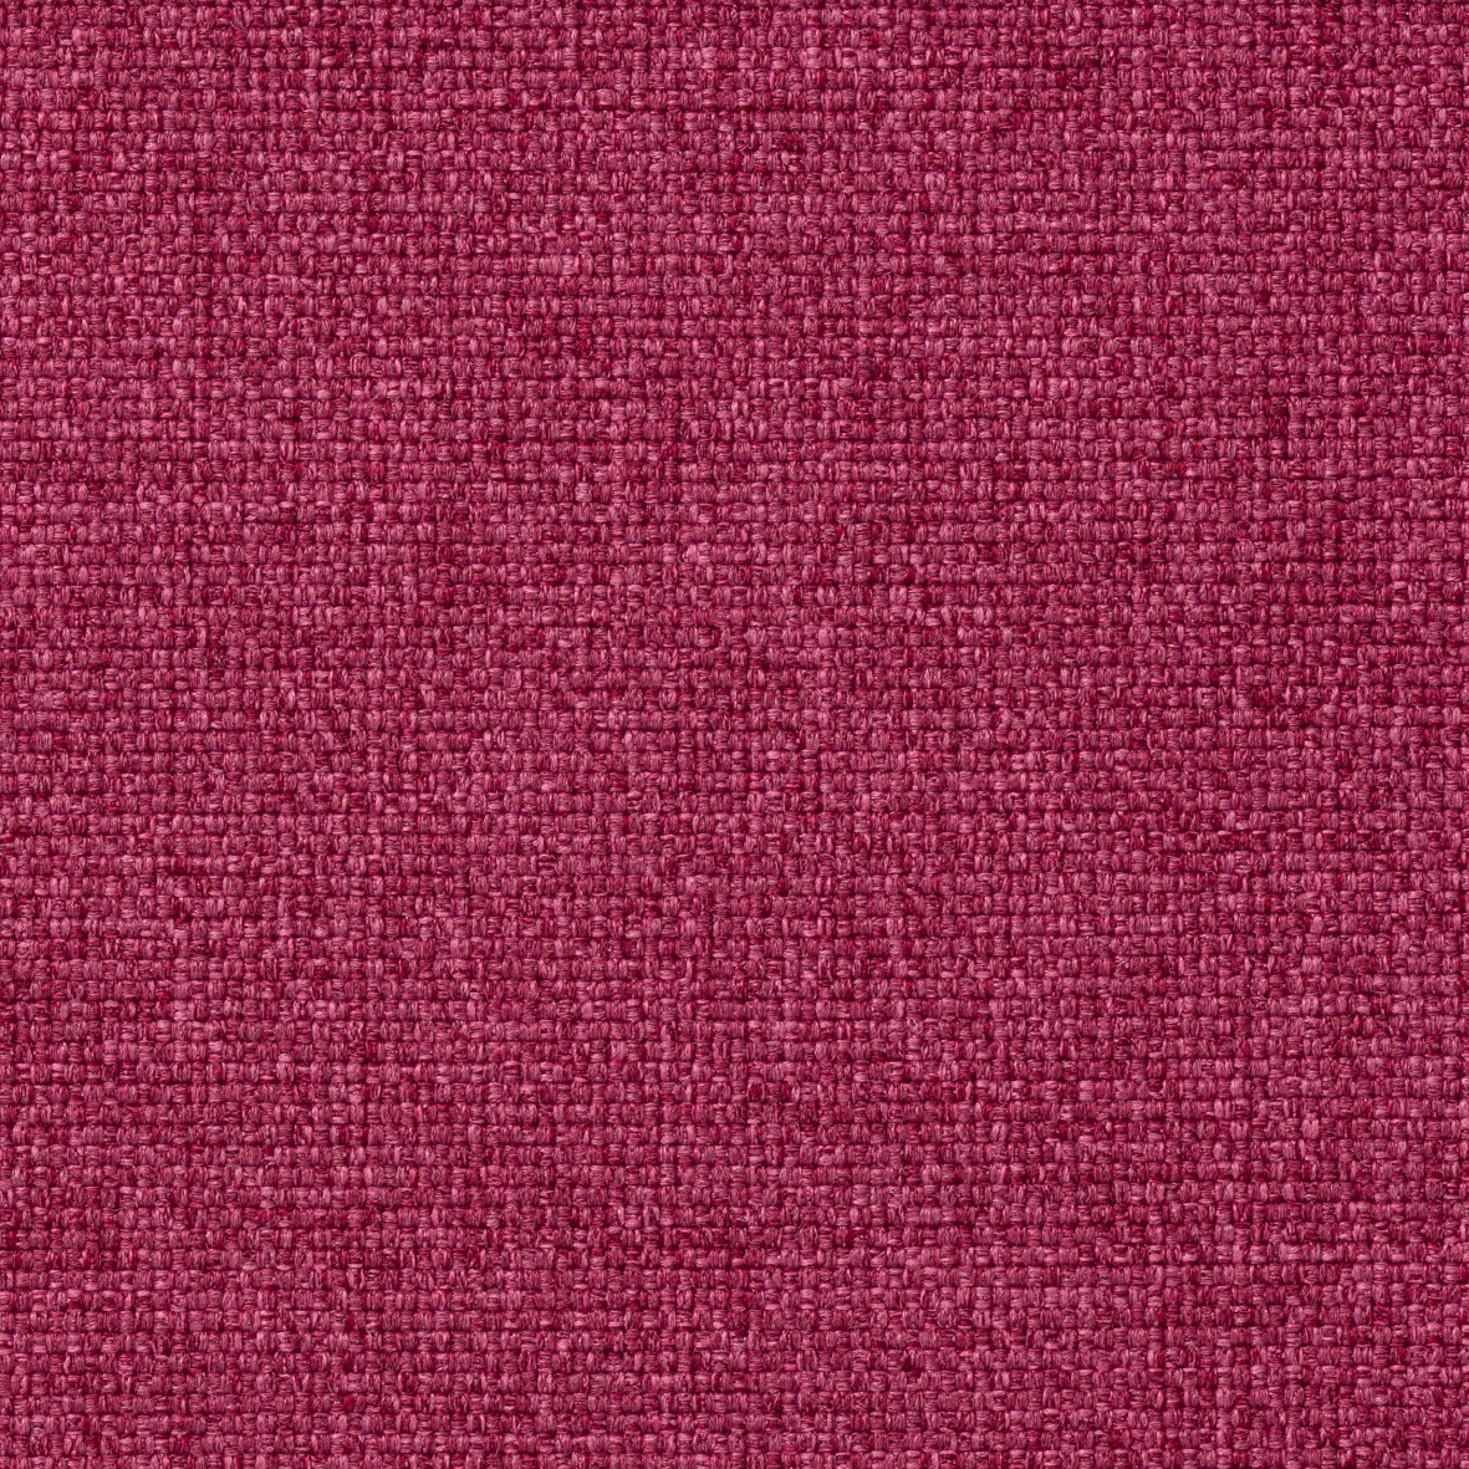 Medley Dark Pink 64125